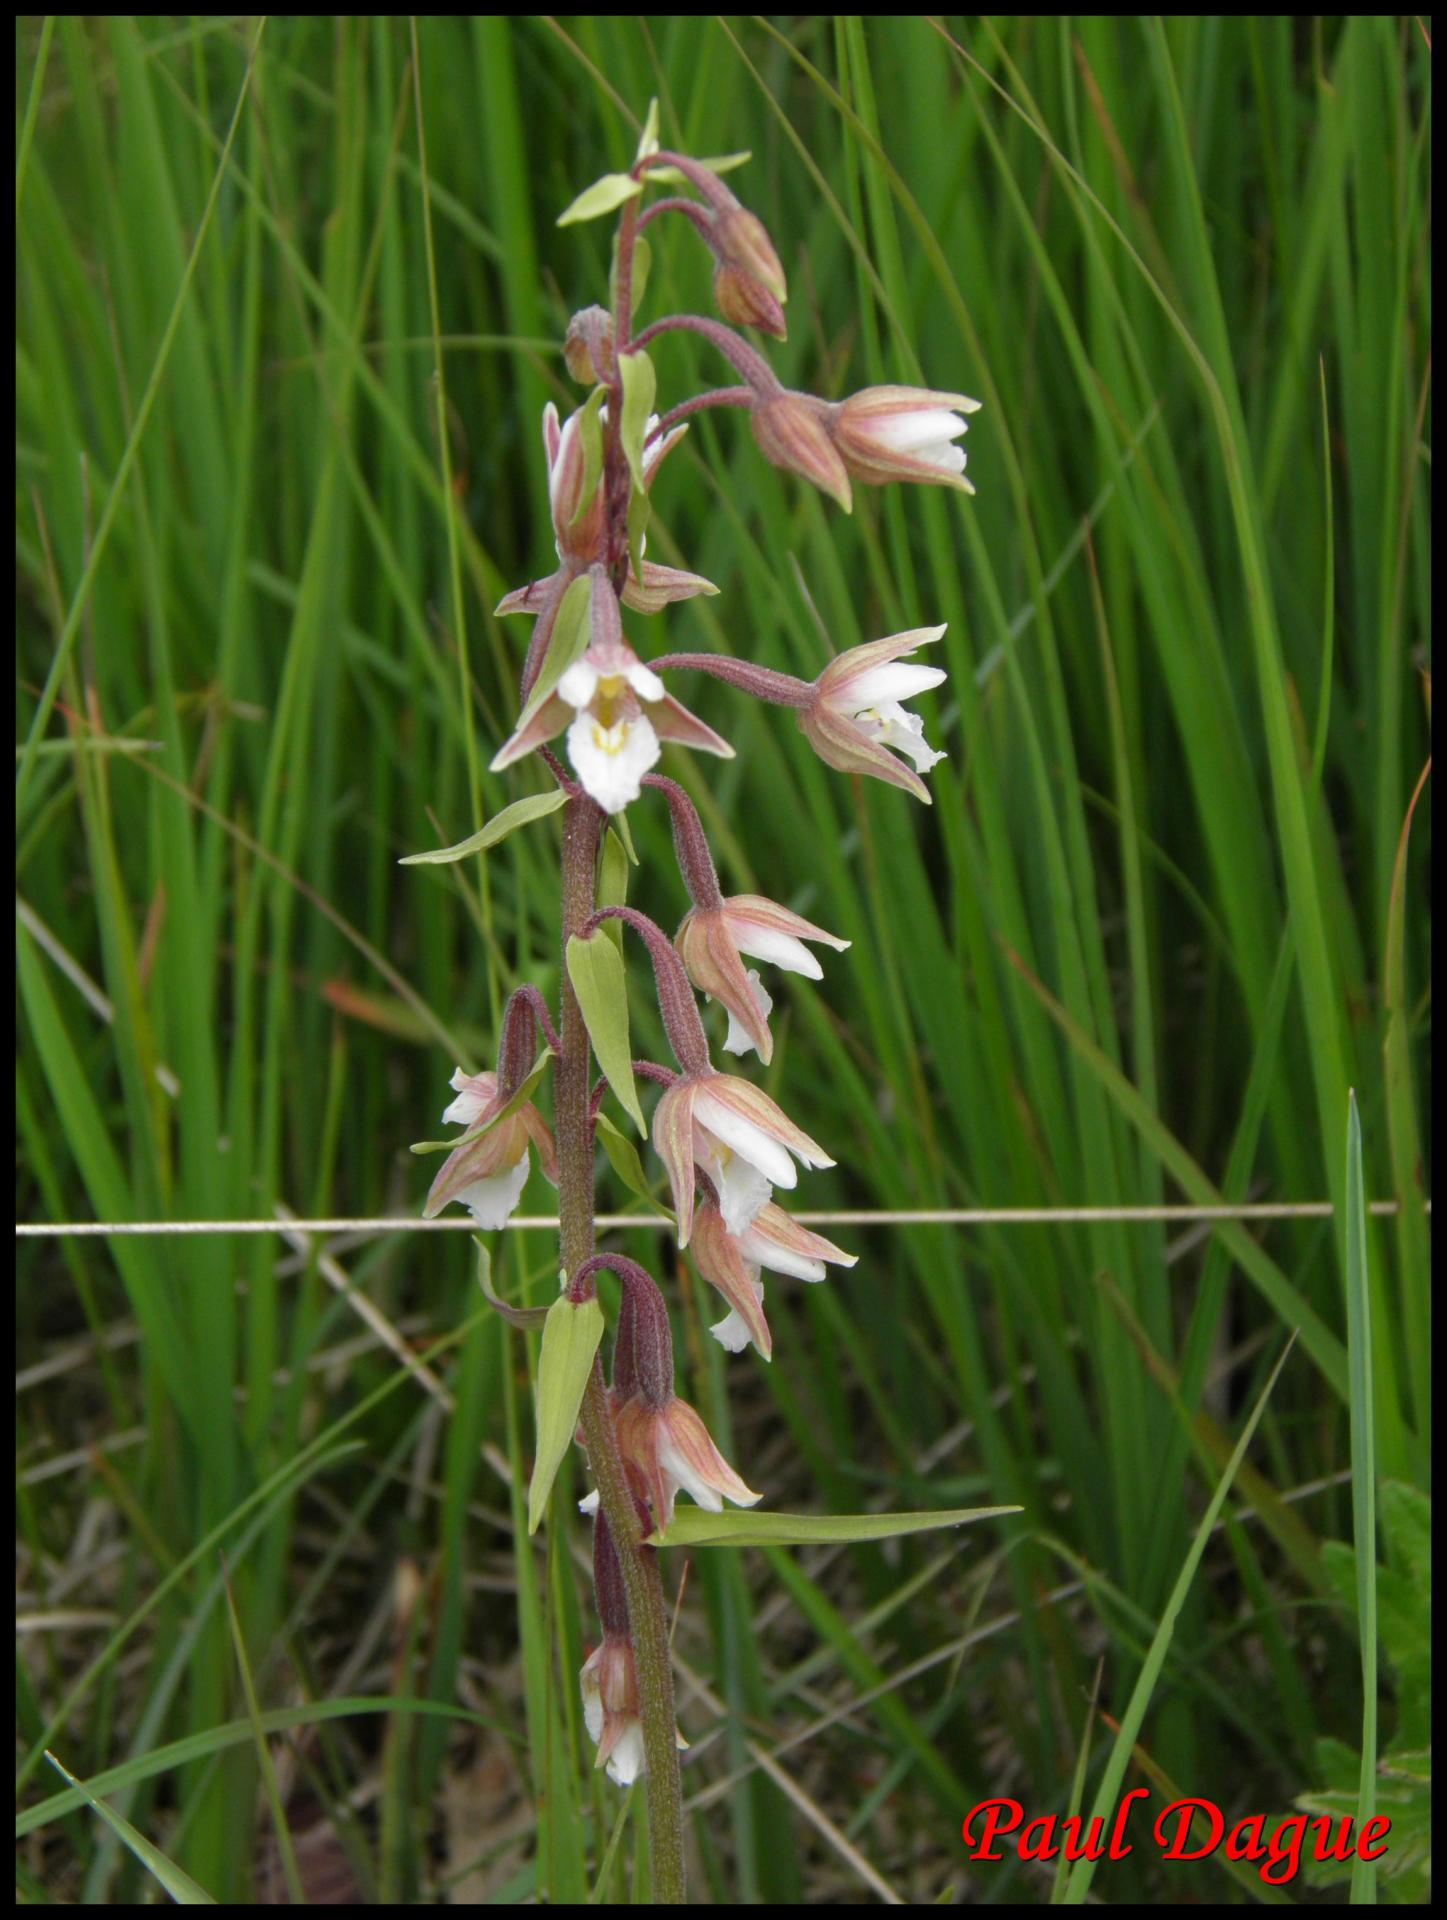 113 epipactis des marais epipactis palustris orchidacee